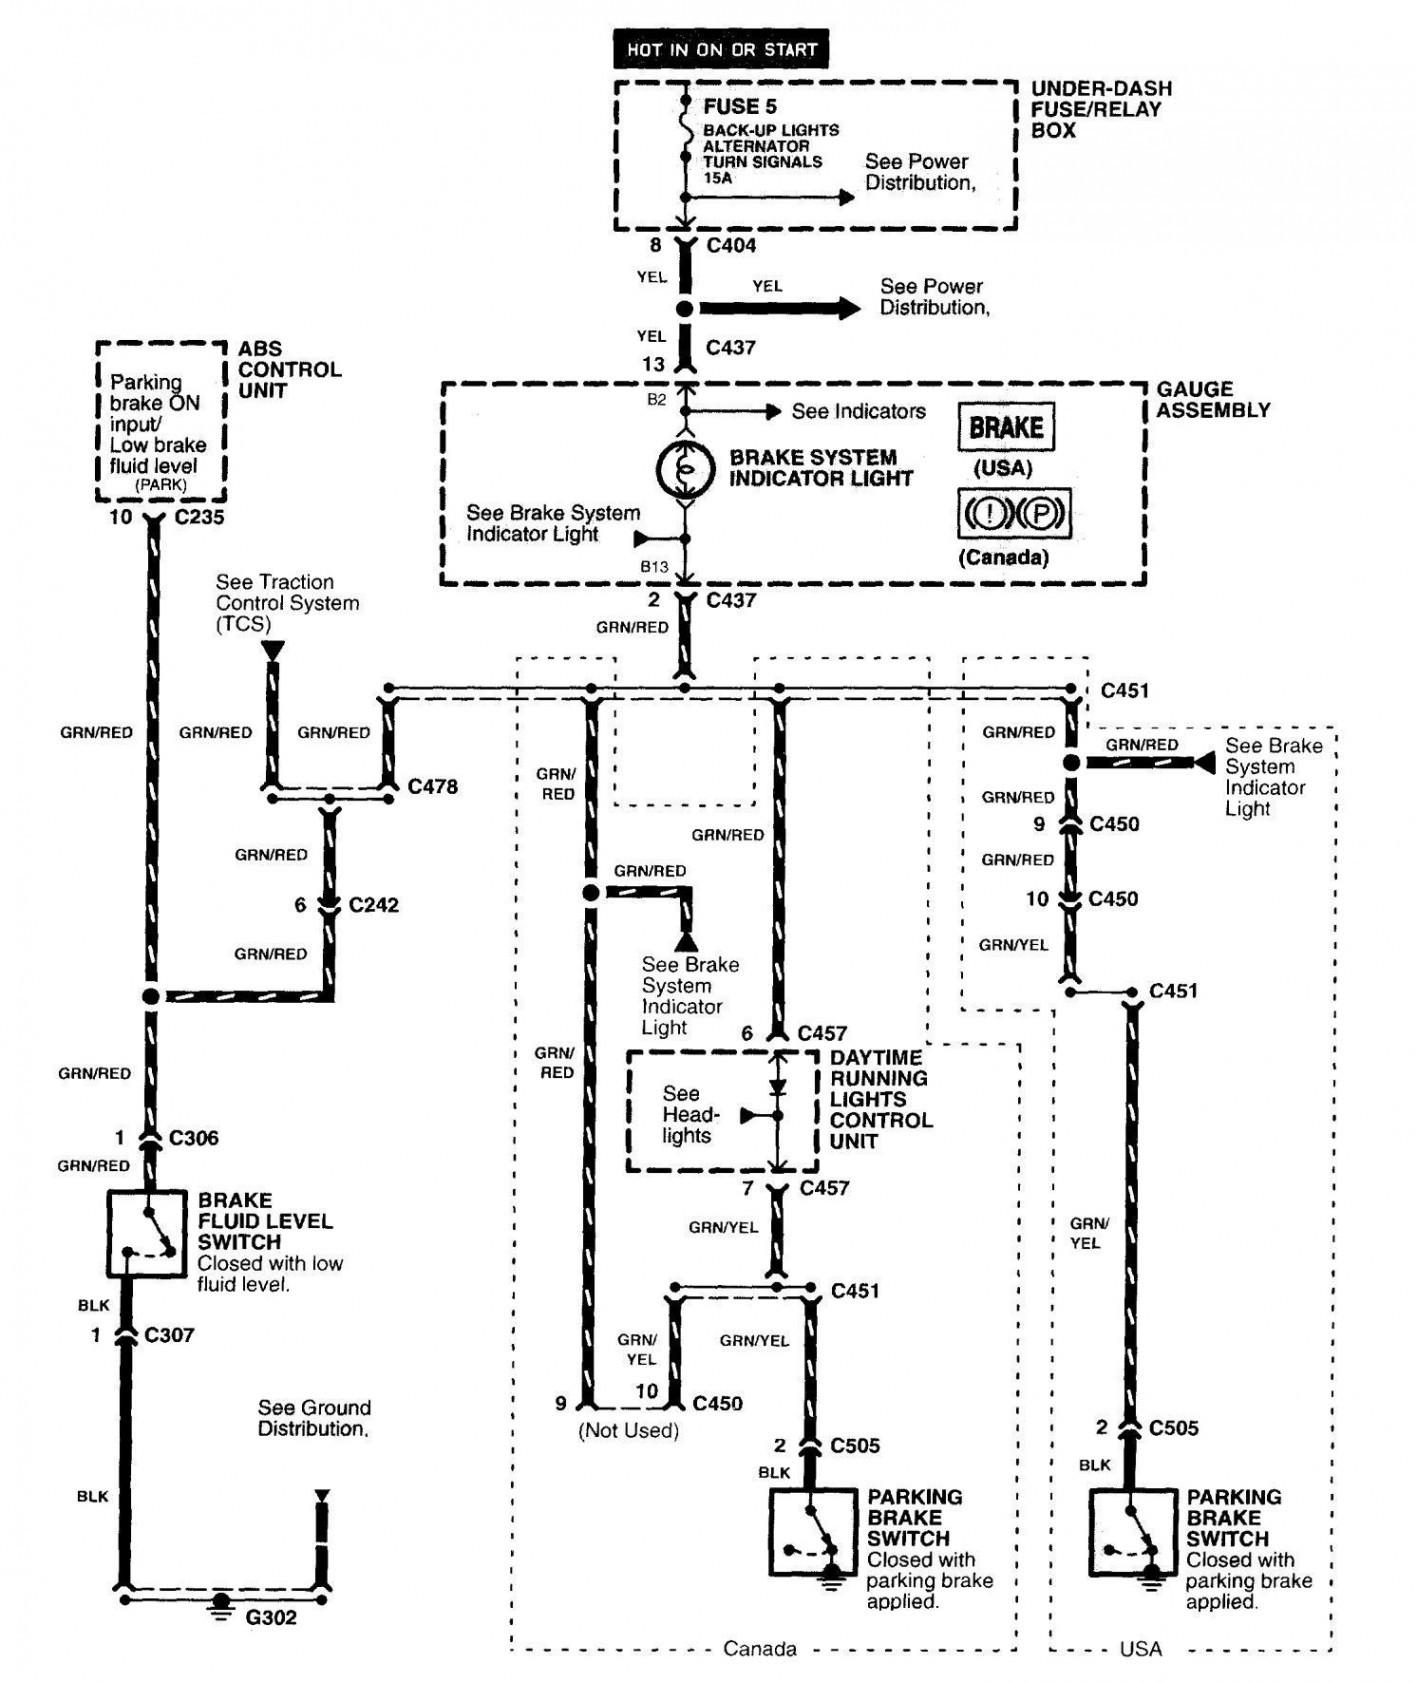 Mazda Rotary Engine Diagram 1987 Mazda Wiring Hot Data Schematics Wiring Diagram • Of Mazda Rotary Engine Diagram